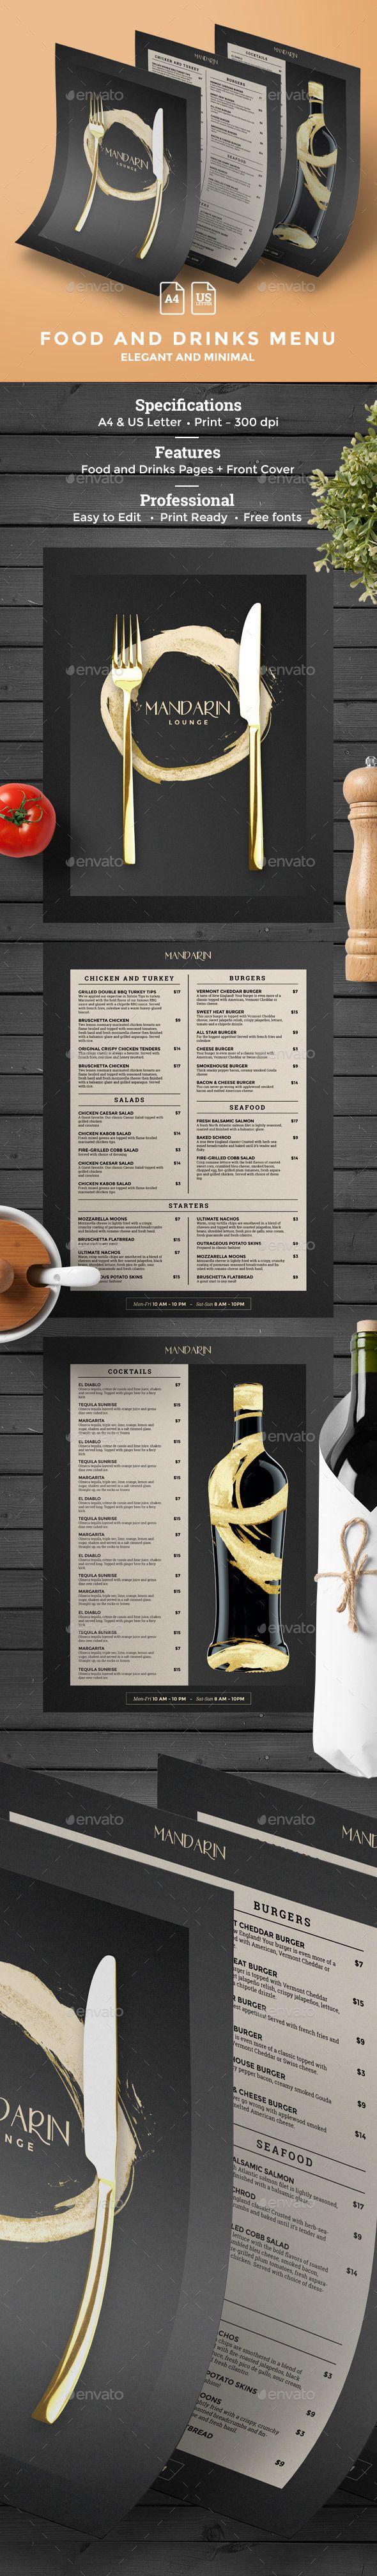 Menu Template — Photoshop PSD #loft #clean • Download ➝ https://graphicriver.net/item/menu-template/19477903?ref=pxcr